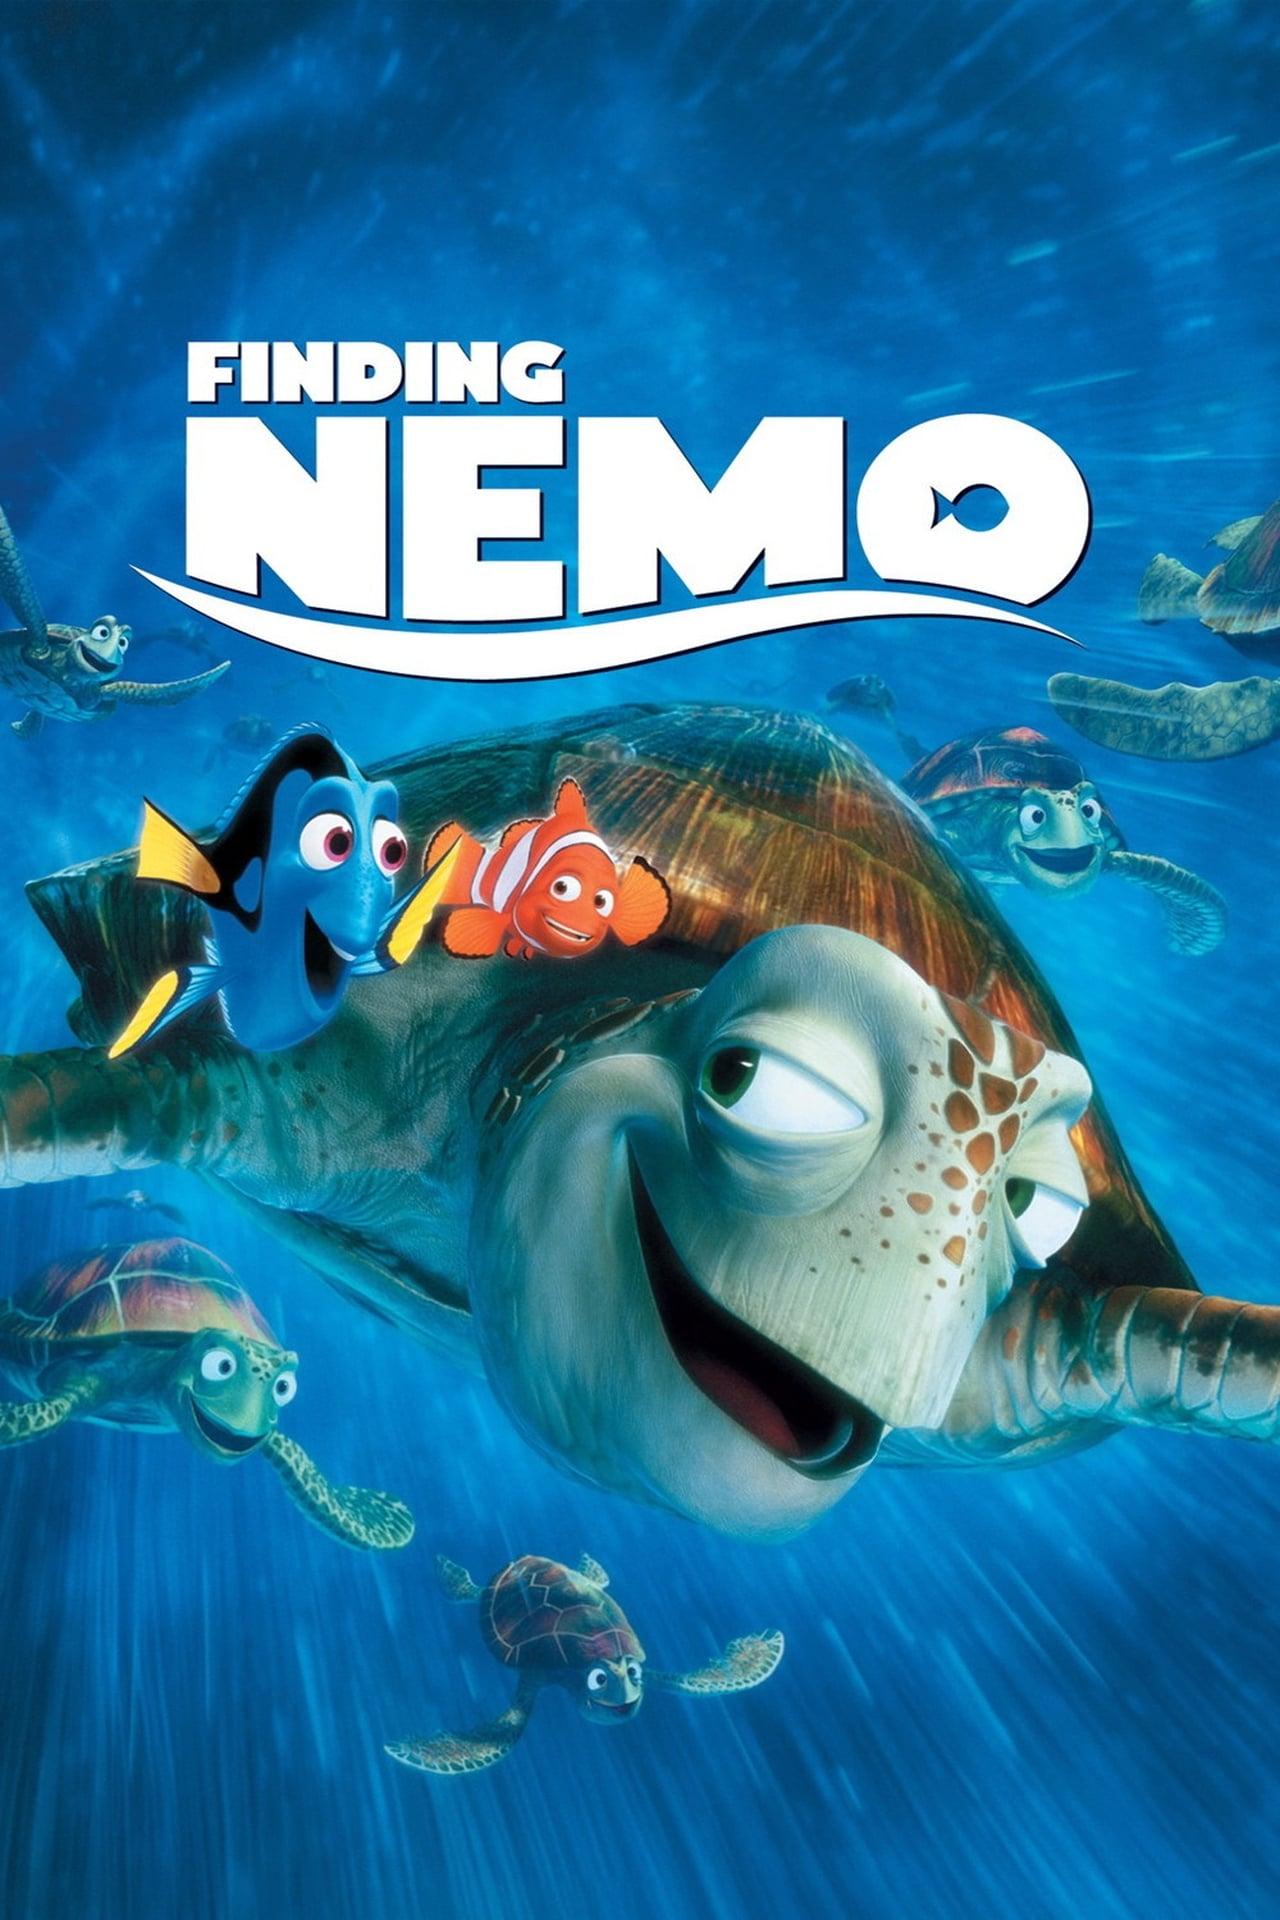 Finding.nemo.dvdrip.xvid vite subtitles